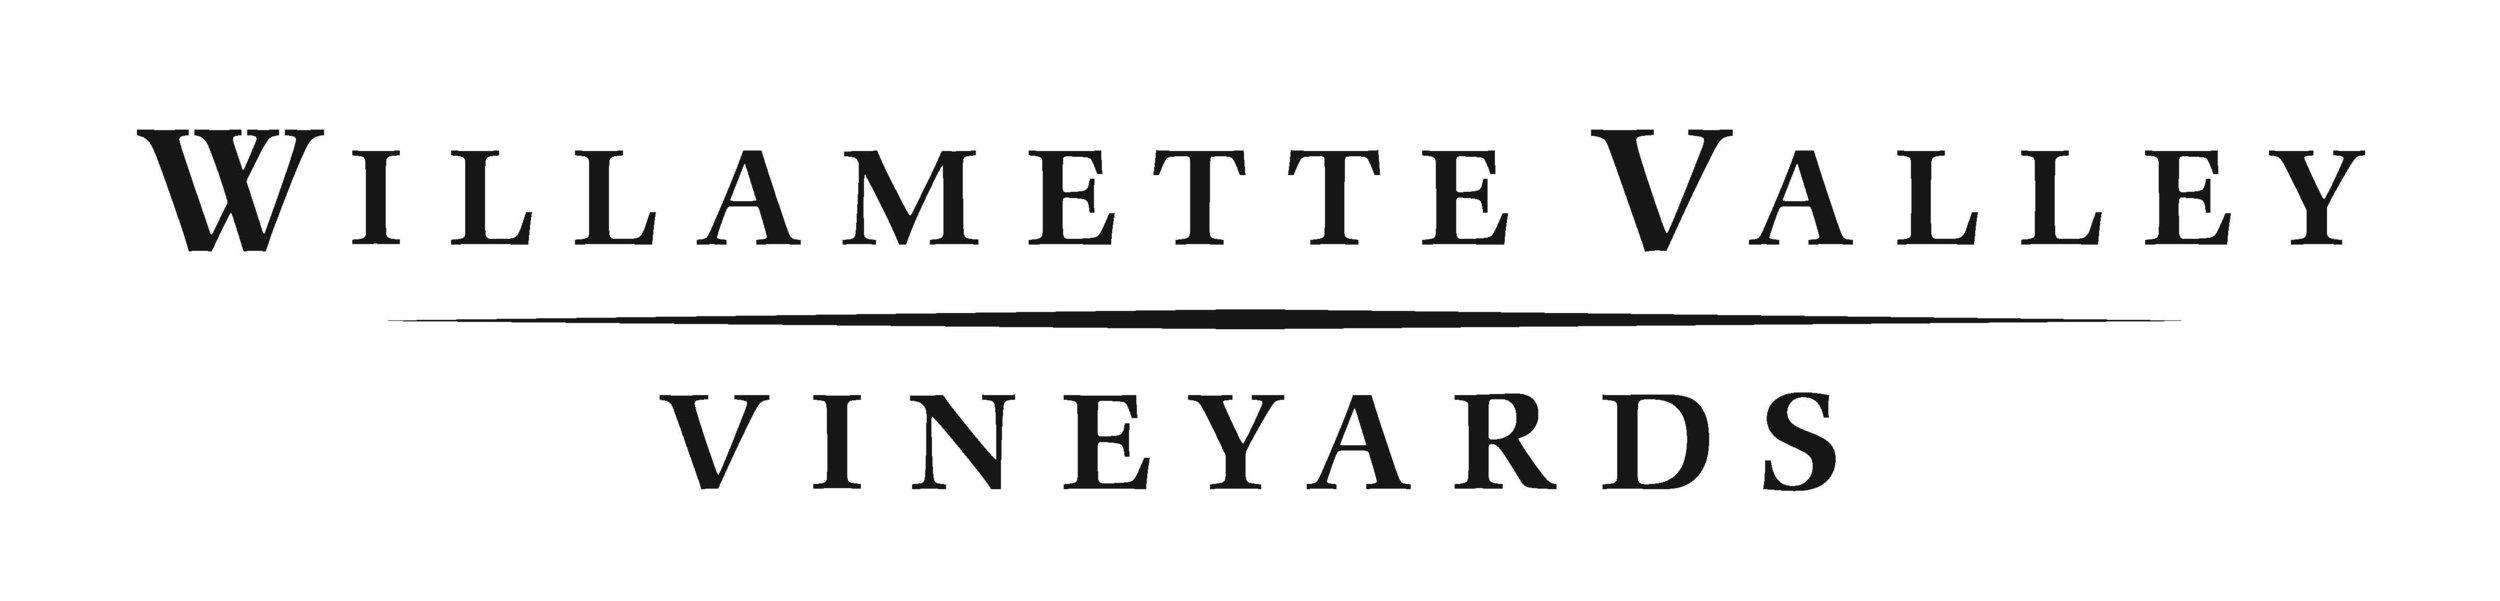 willamette valley vineyards logo.jpg